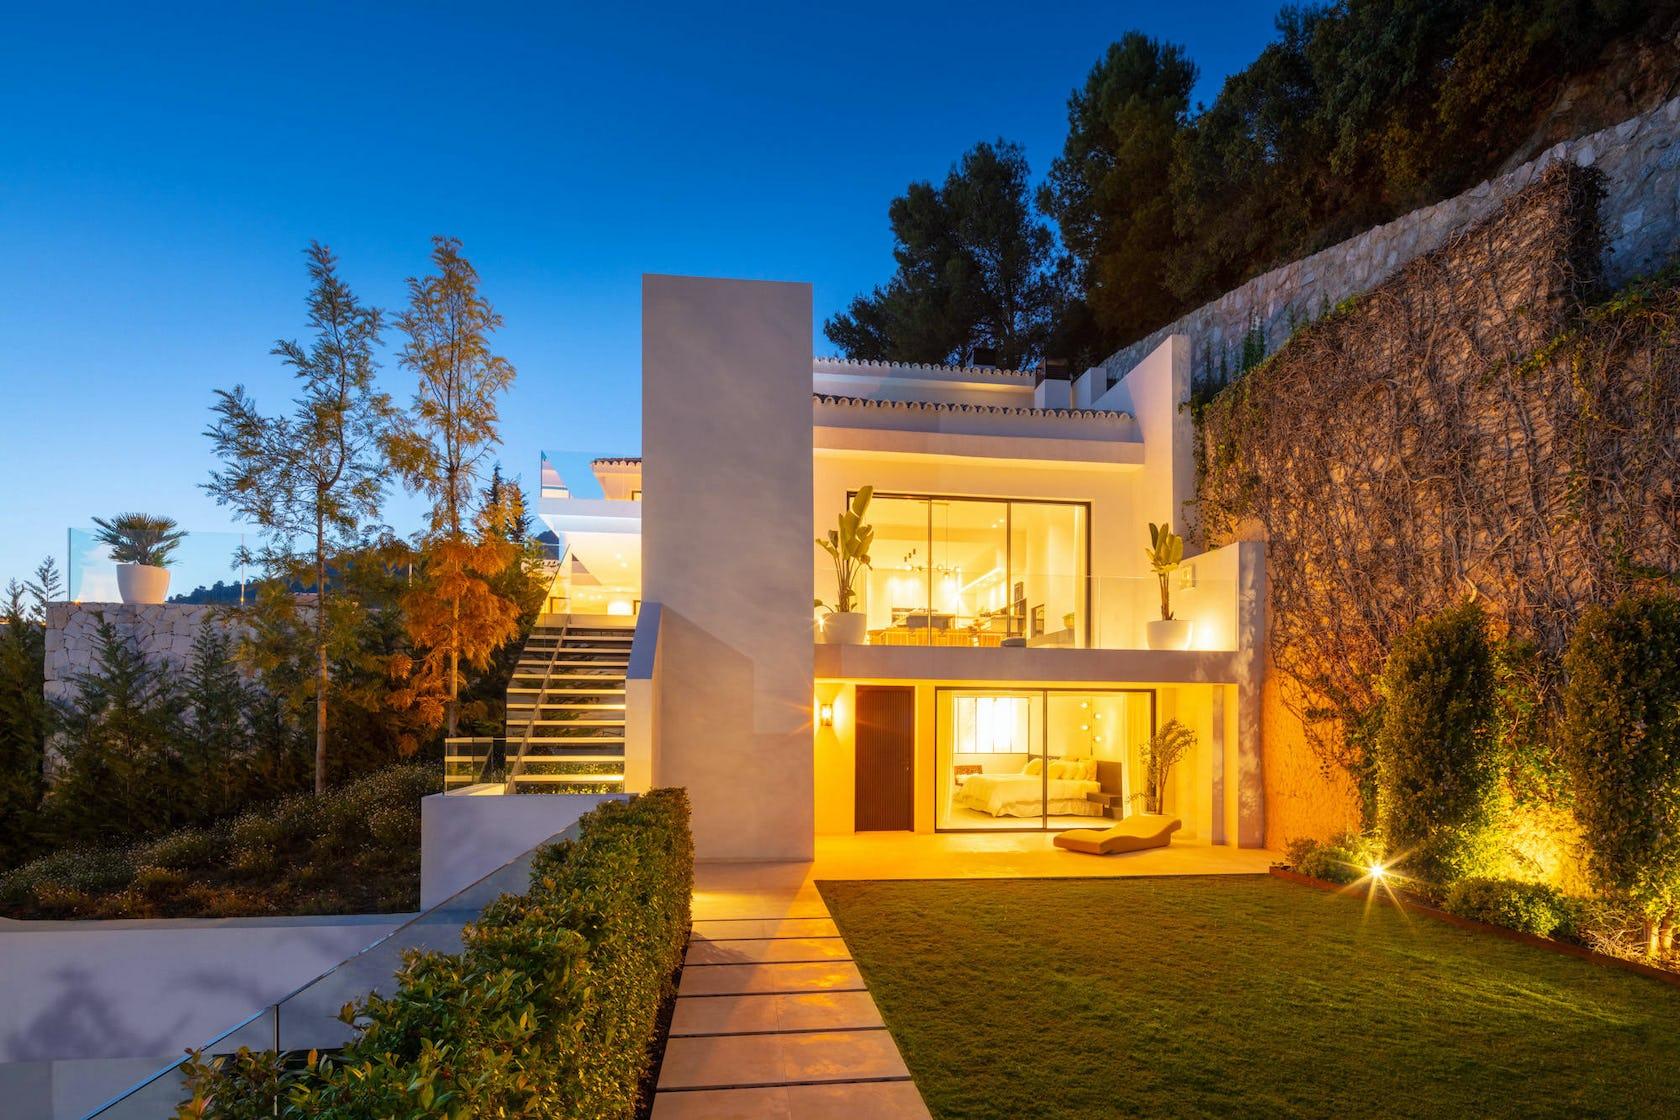 grass plant housing building mansion house villa architecture